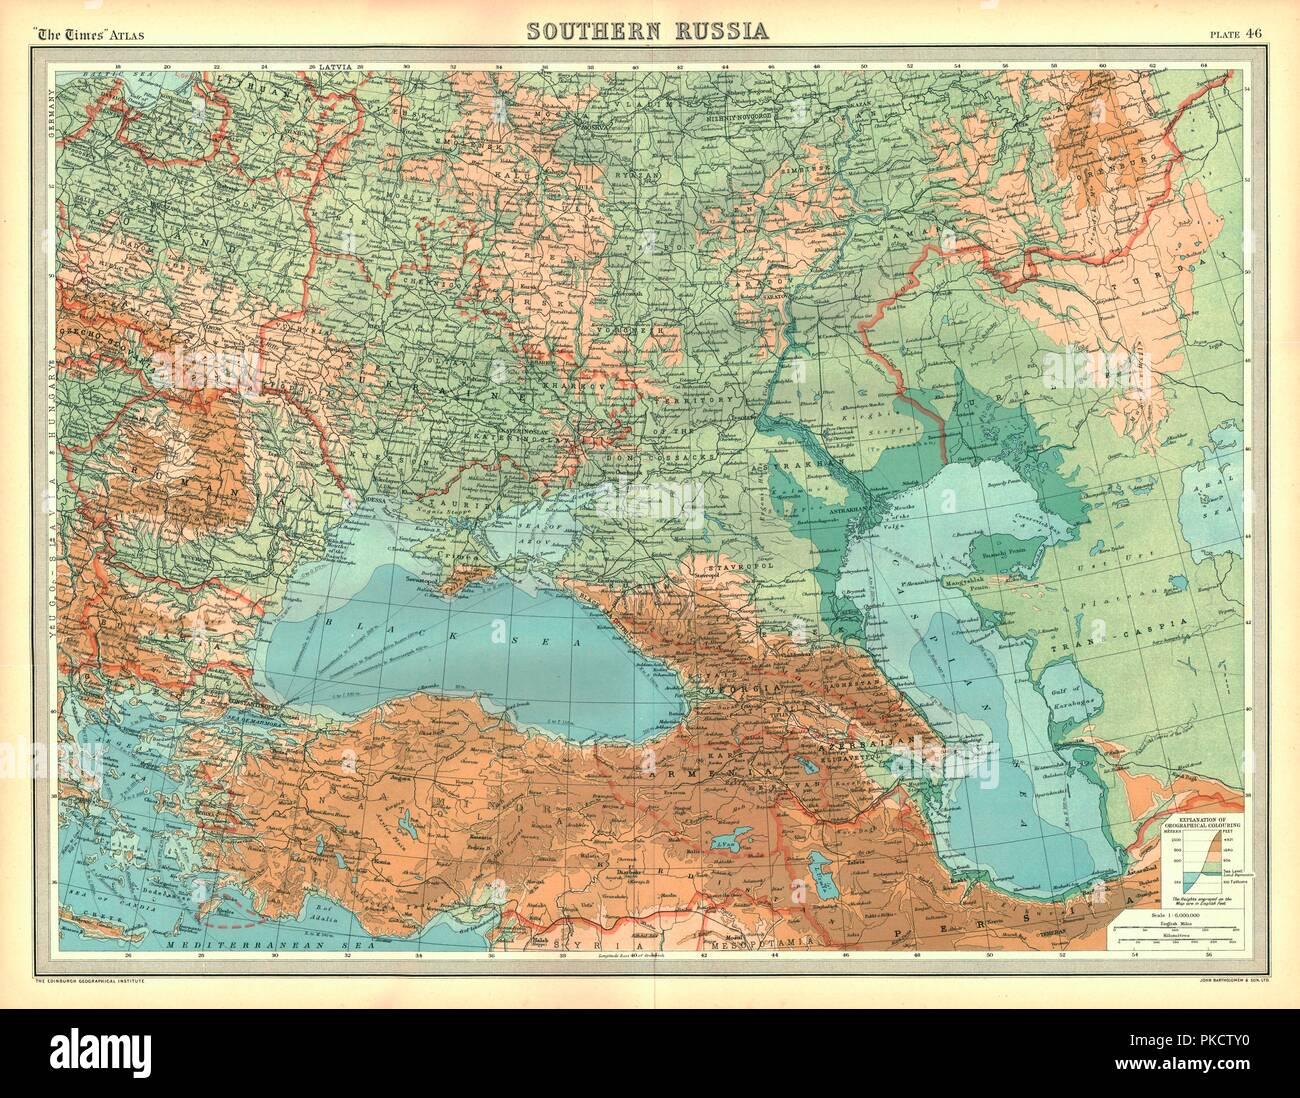 World Map Caspian Sea.Caspian Sea Map Stock Photos Caspian Sea Map Stock Images Alamy